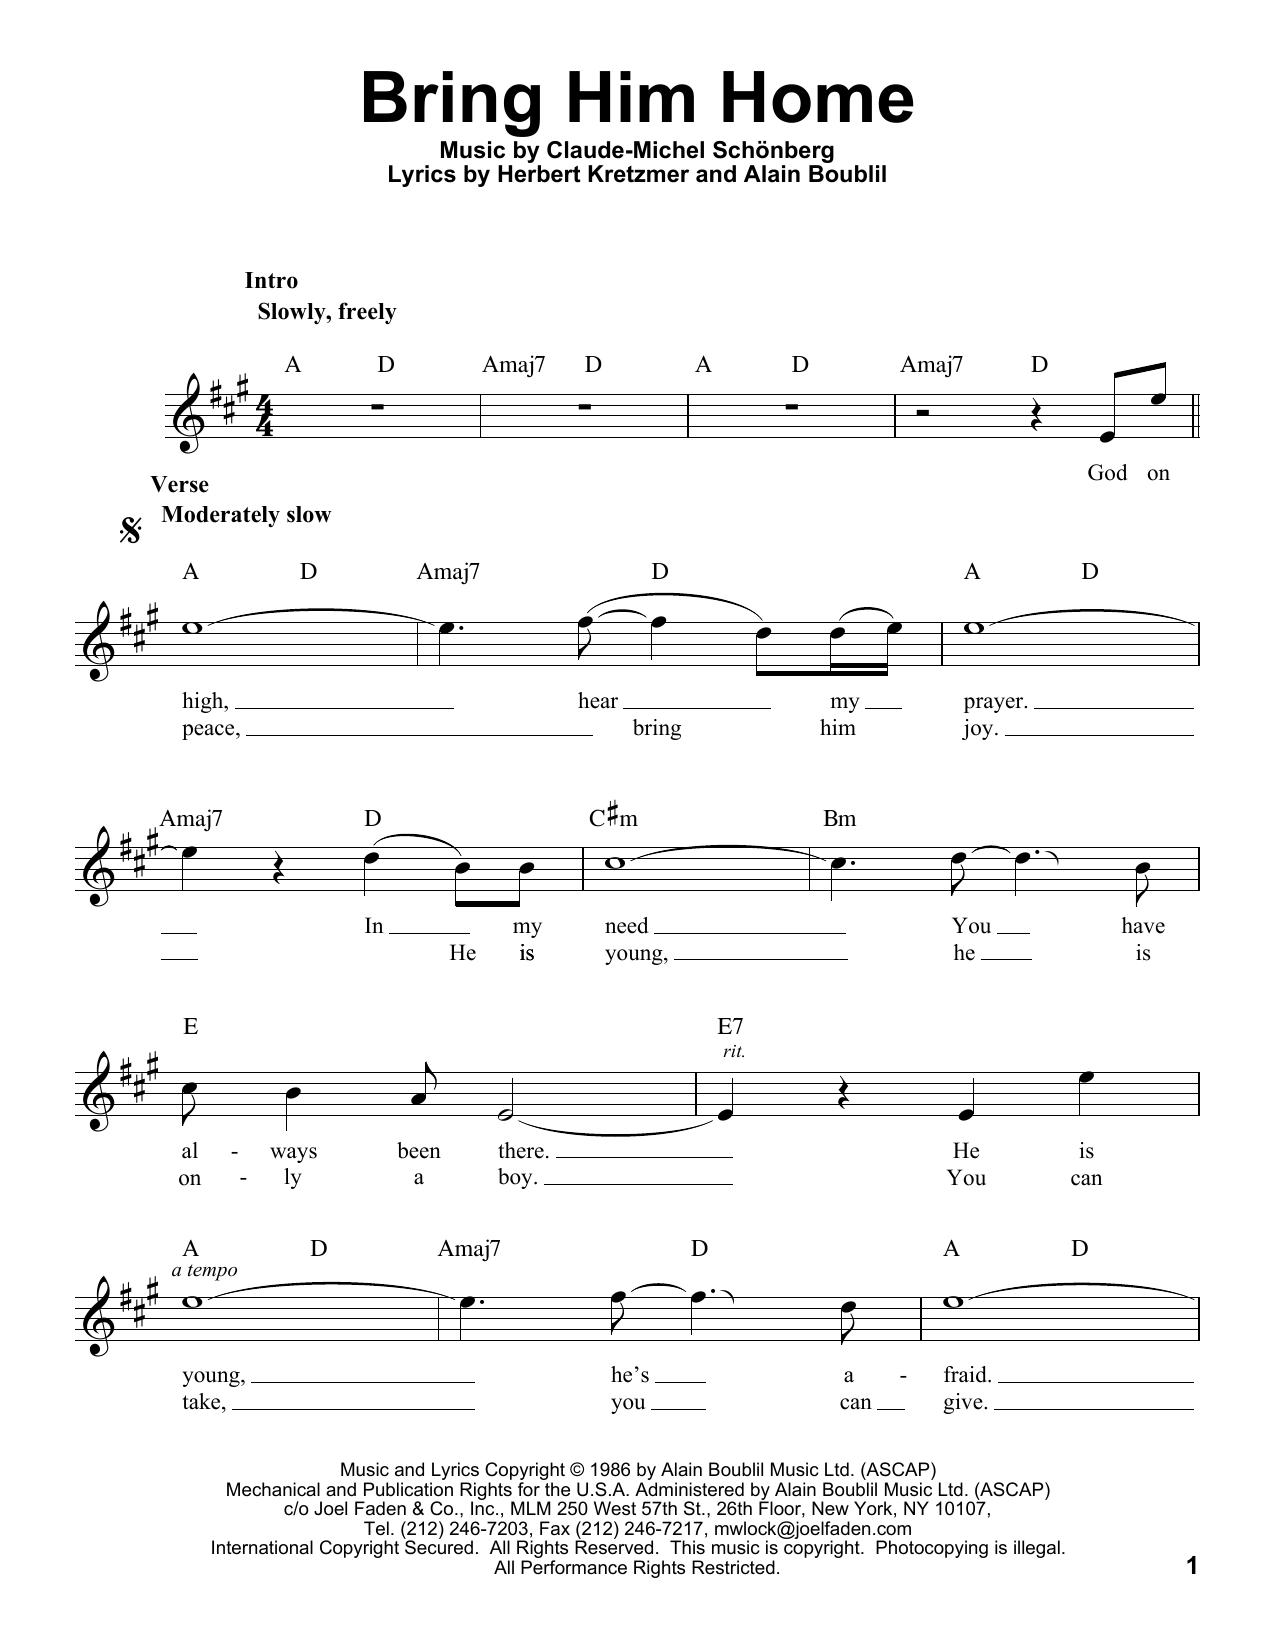 Bring Him Home sheet music by Claude Michel Schonberg Voice